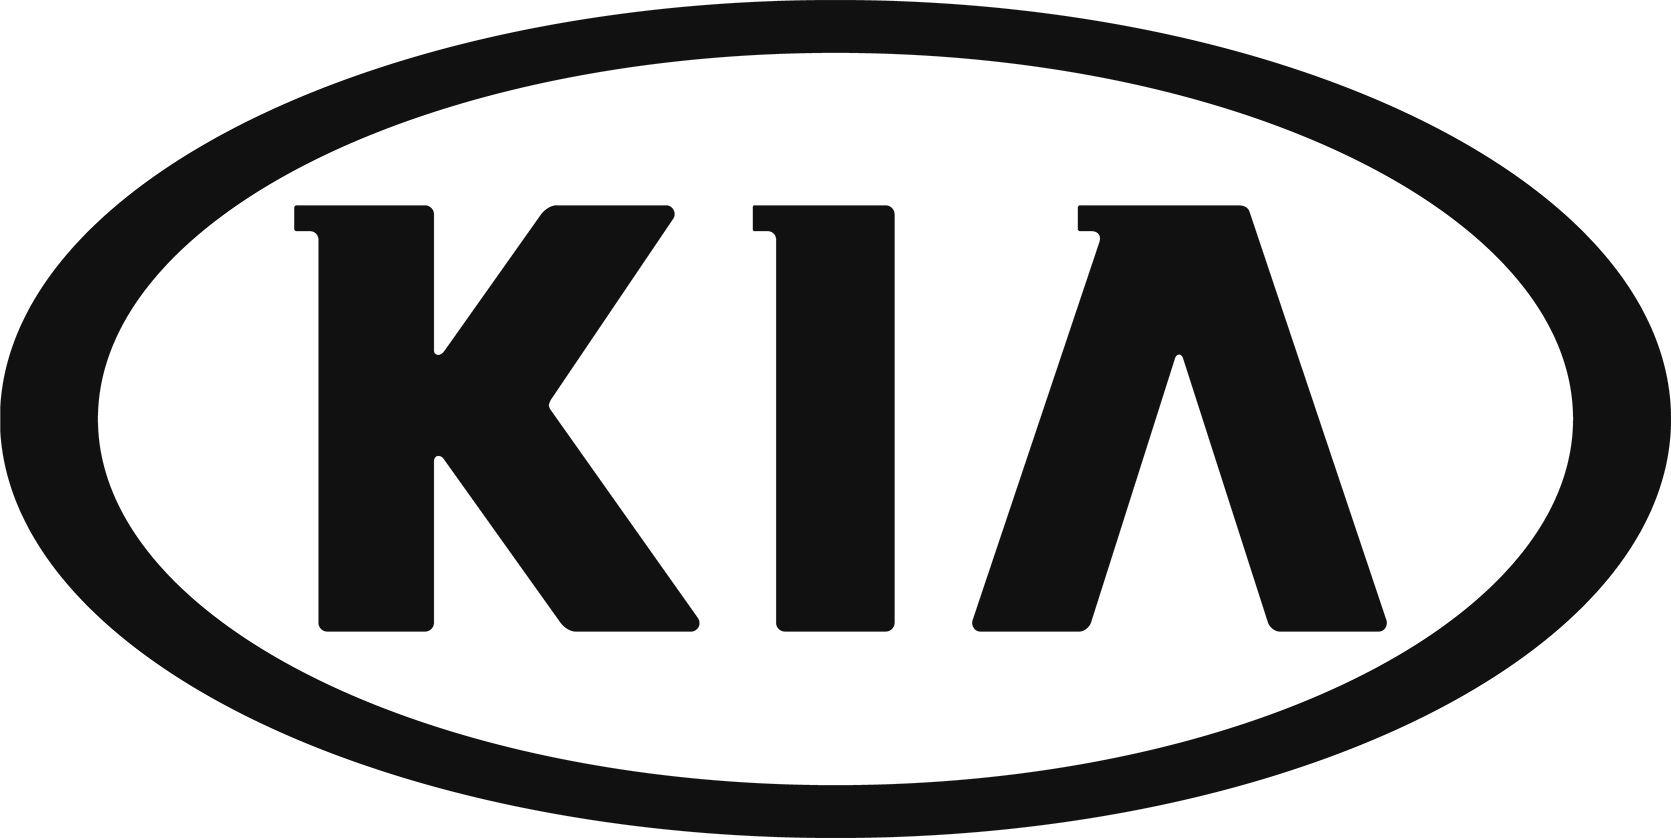 KIA logo with link to https://www.kia.com/us/en/accessibility